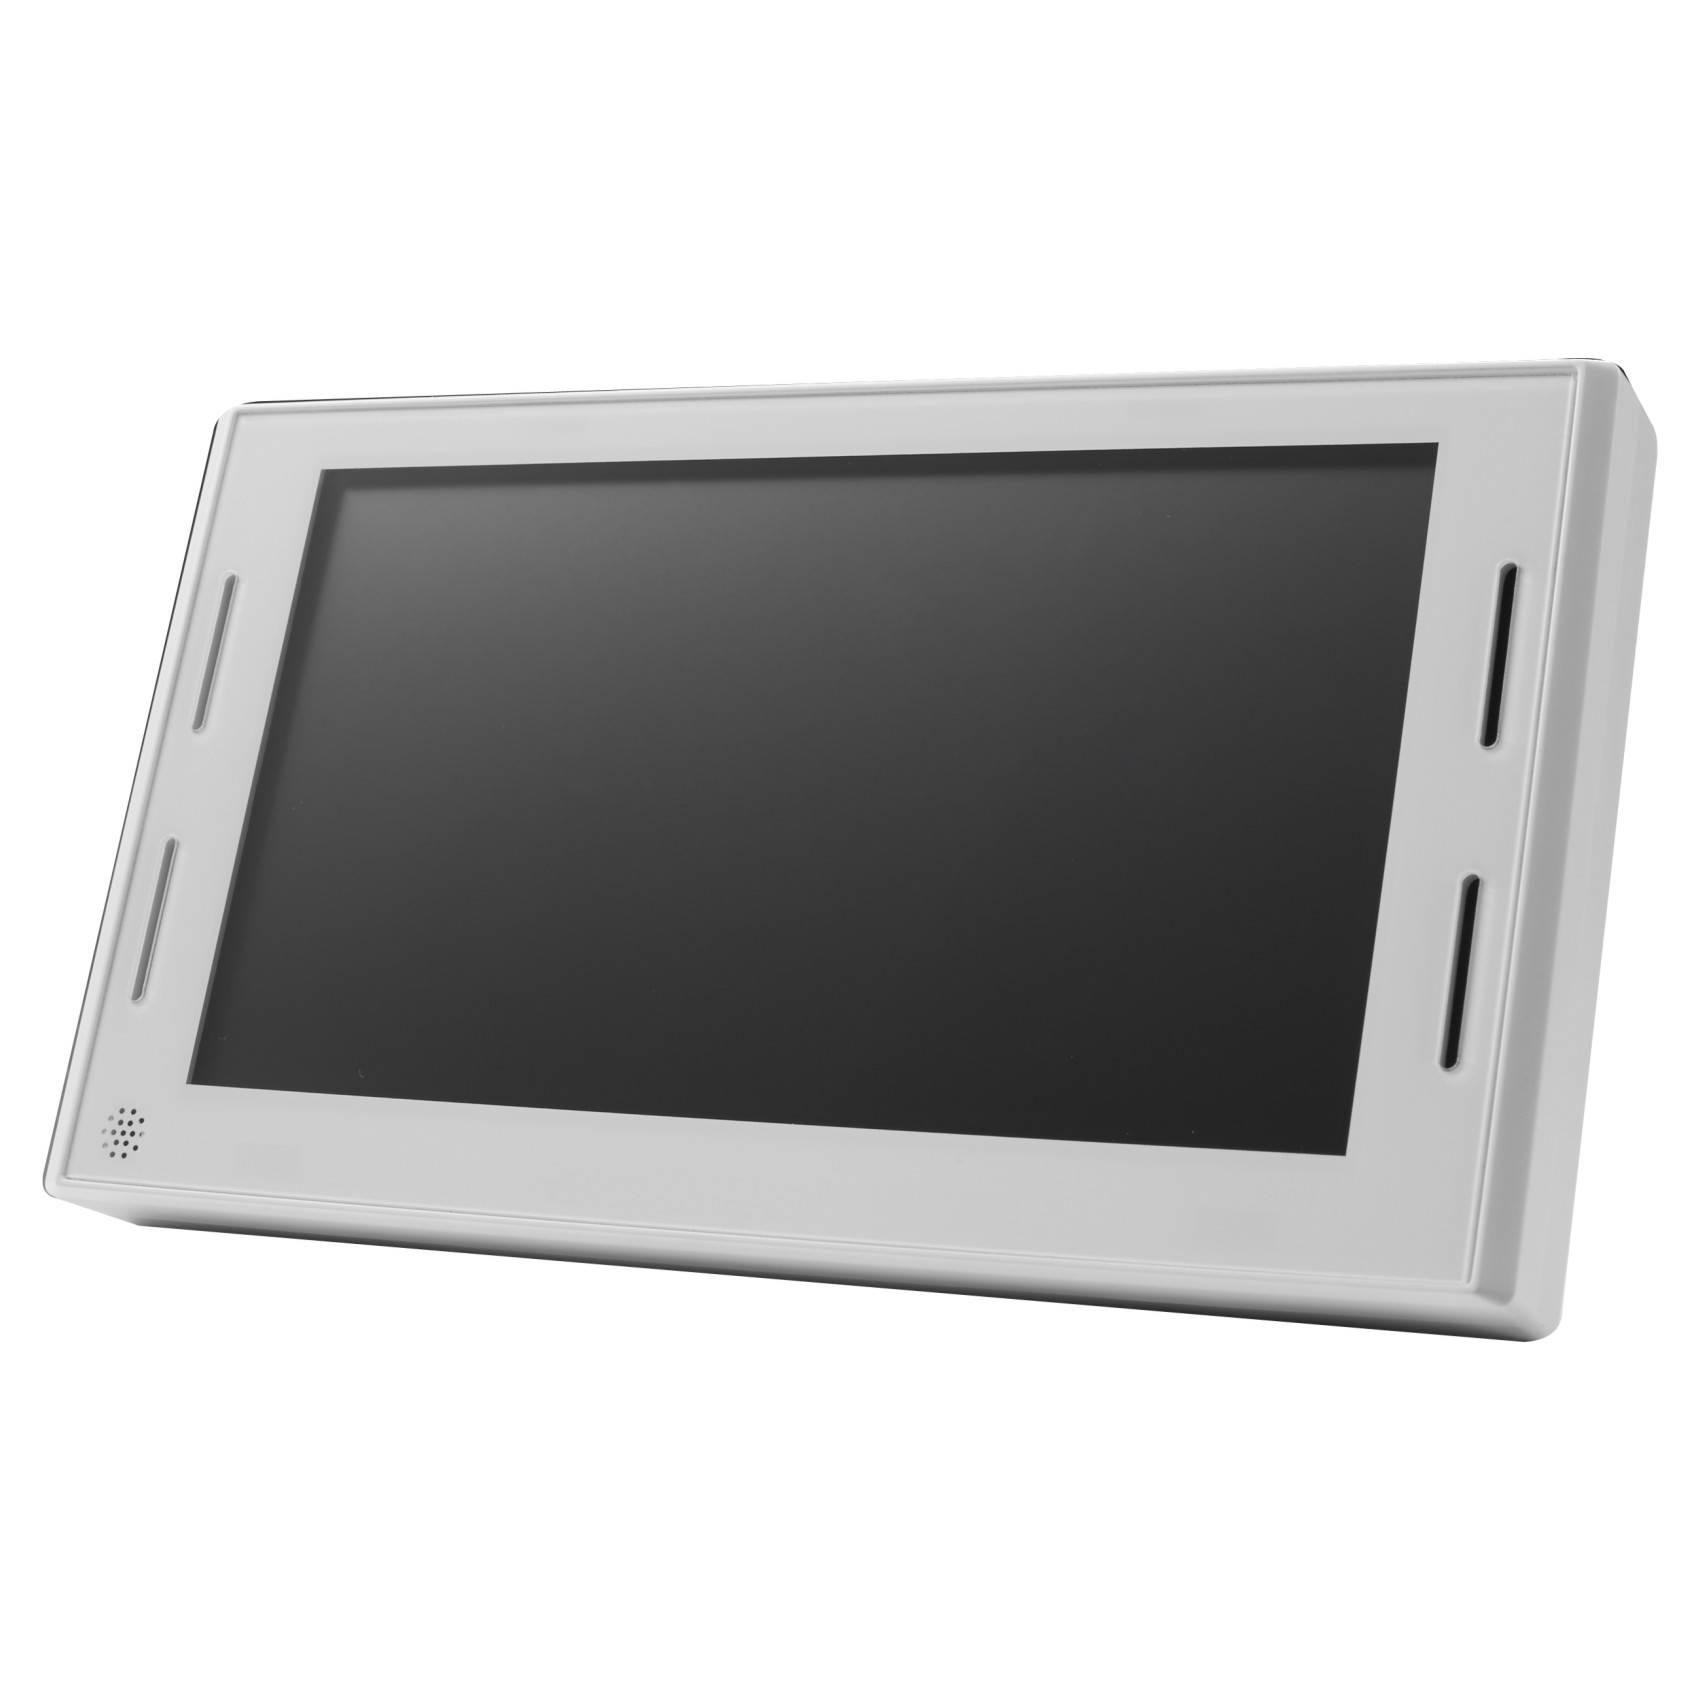 7inch HD Advertising Player